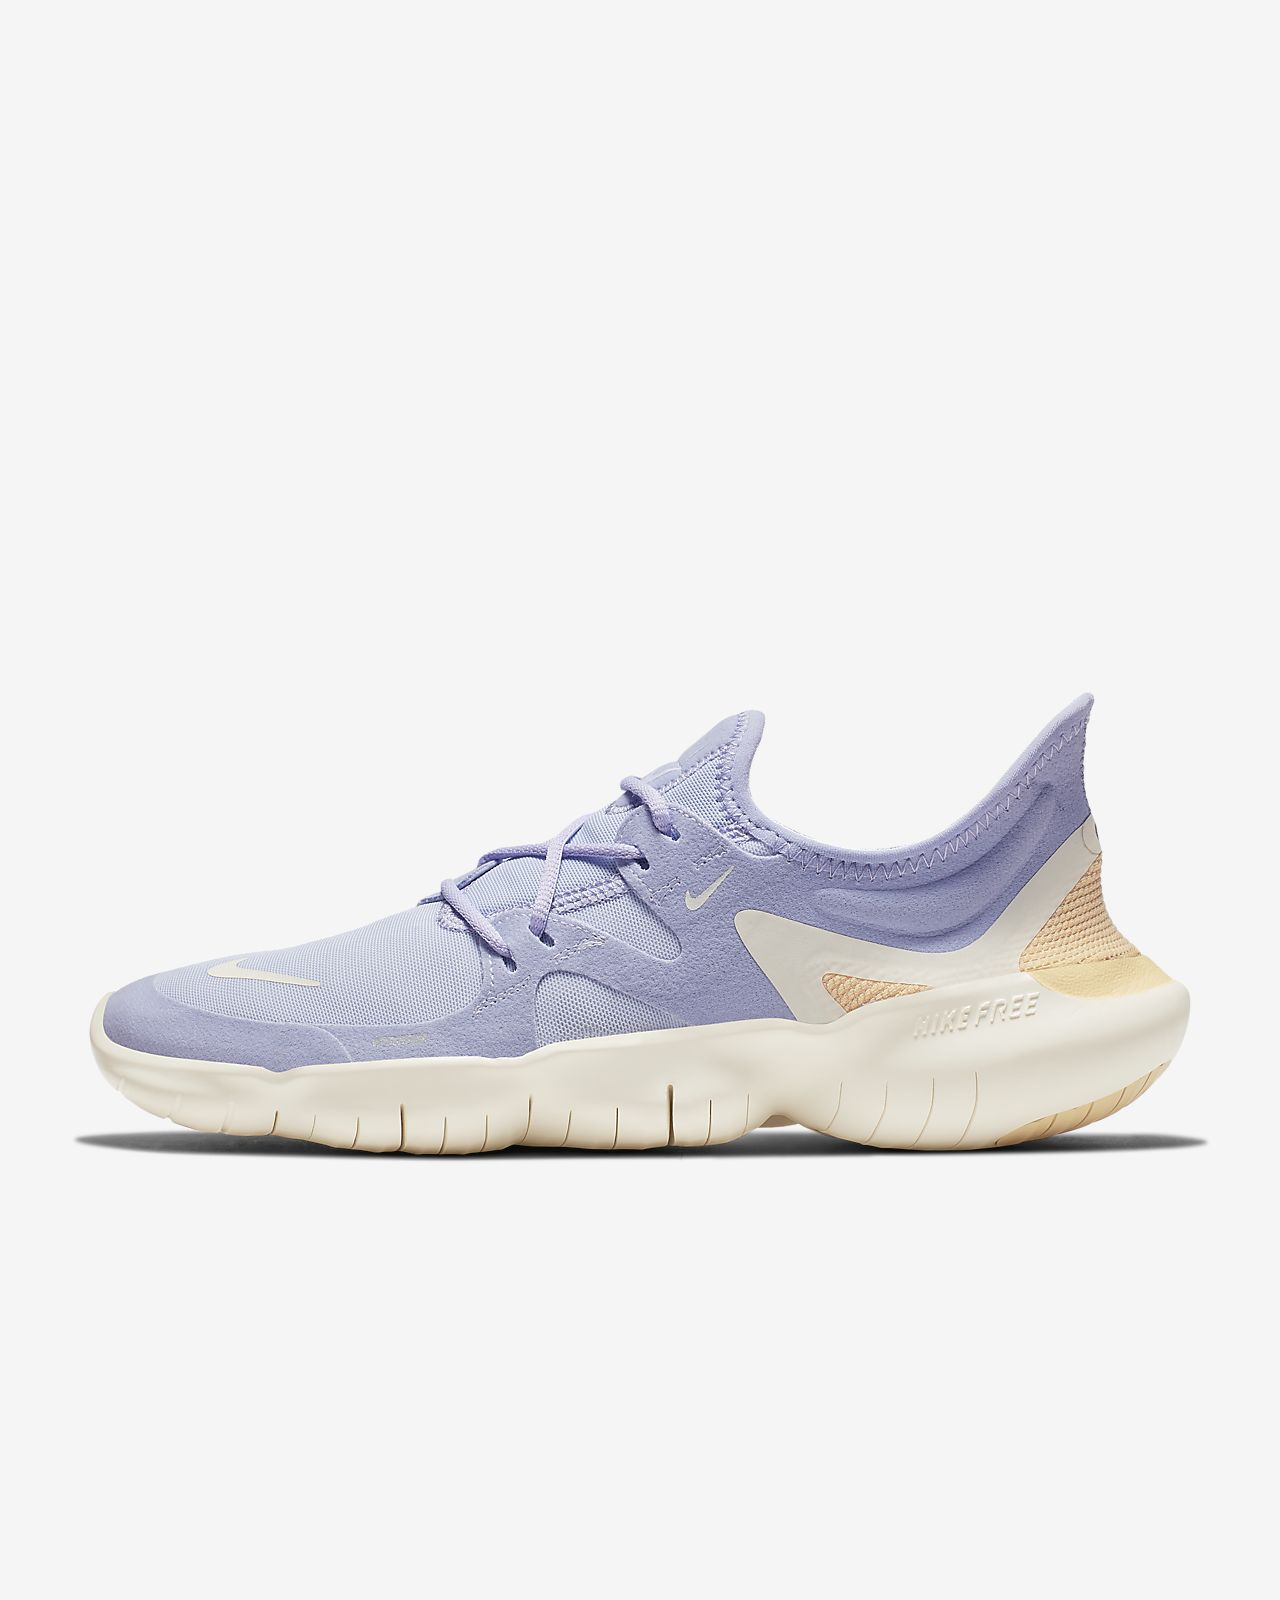 De Rn 5 Pour Xdwrcoeb Femmebe Chaussure Free 0 Nike Running b2WDHIYEe9